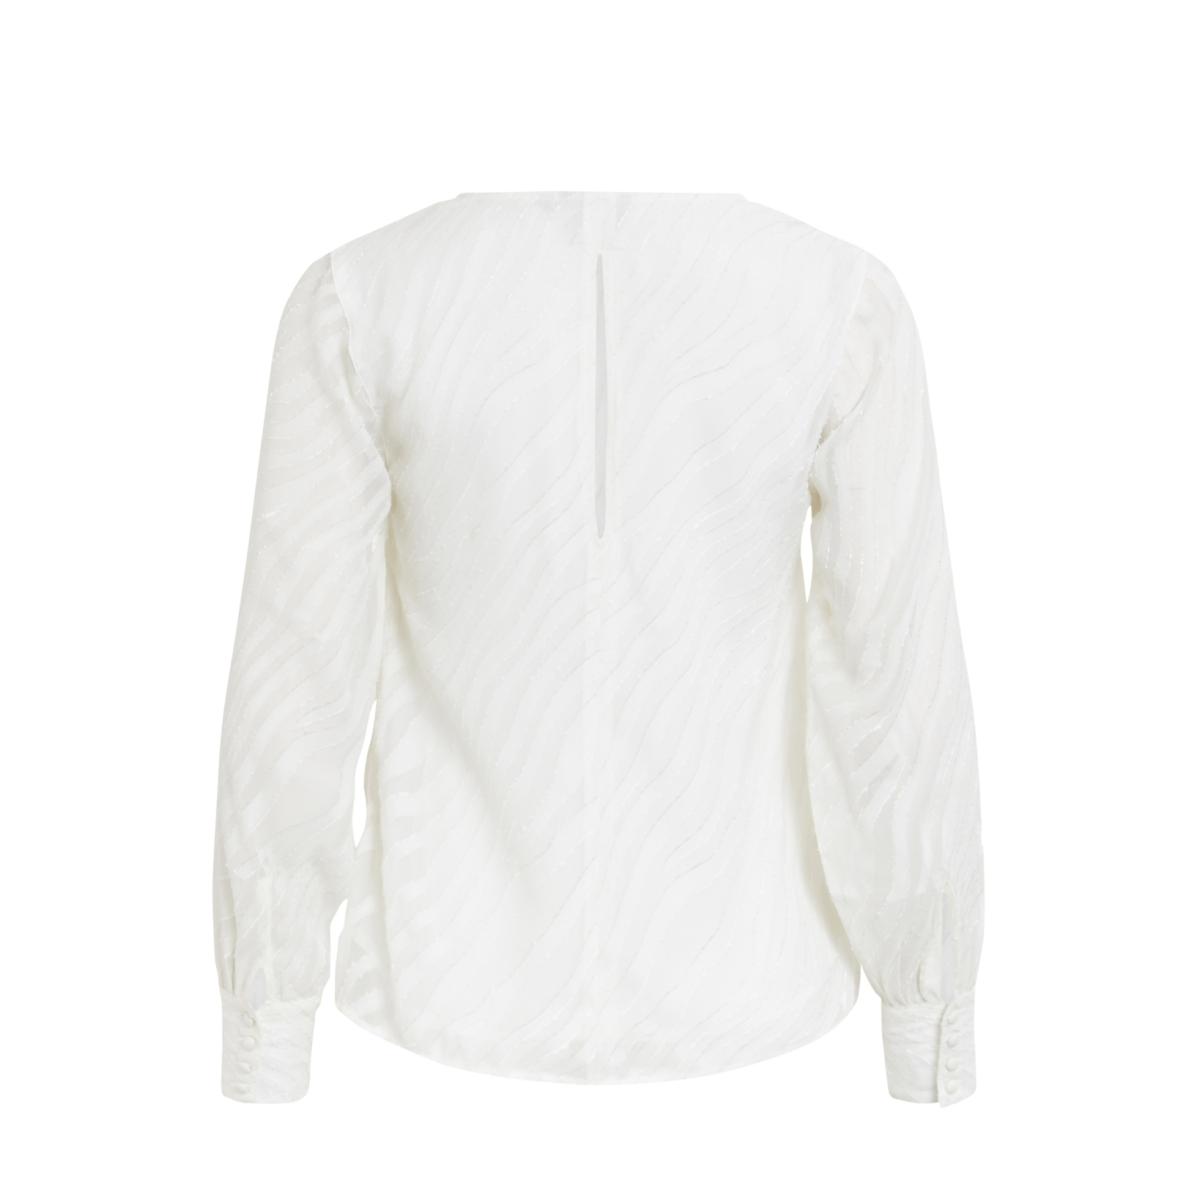 objgabrielle l/s top 94 23025617 object blouse gardenia